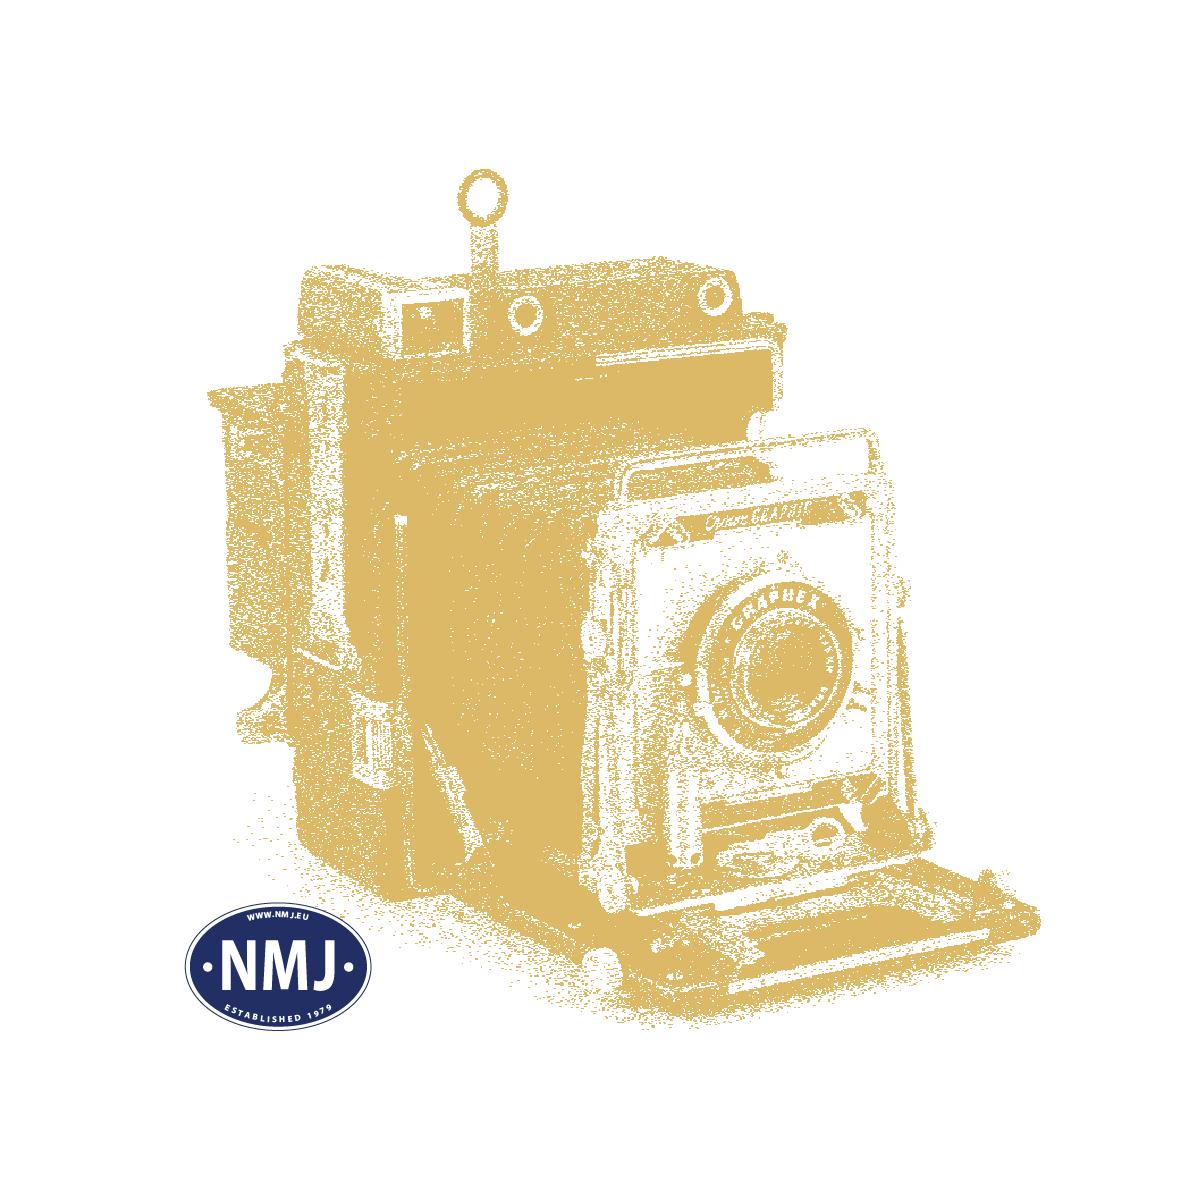 NMJT503.107 - NMJ Topline NSB Gbkls 158 5472-7